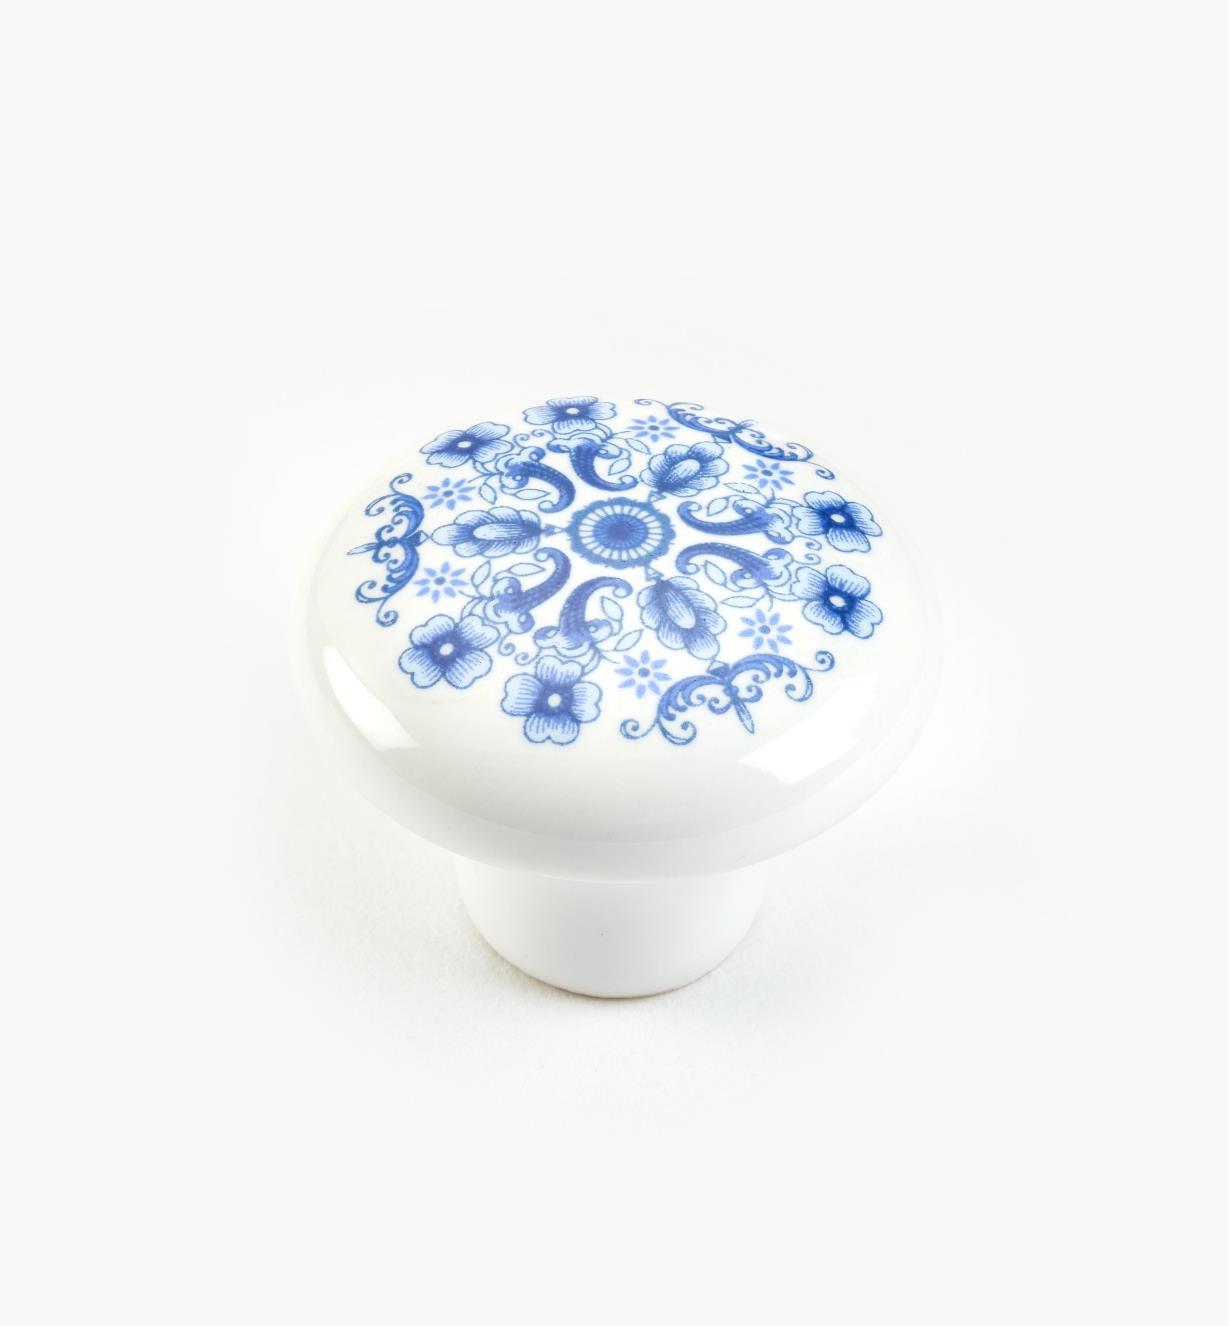 "01W0203 - 1 1/4"" x  15/16"" Blue Knob"